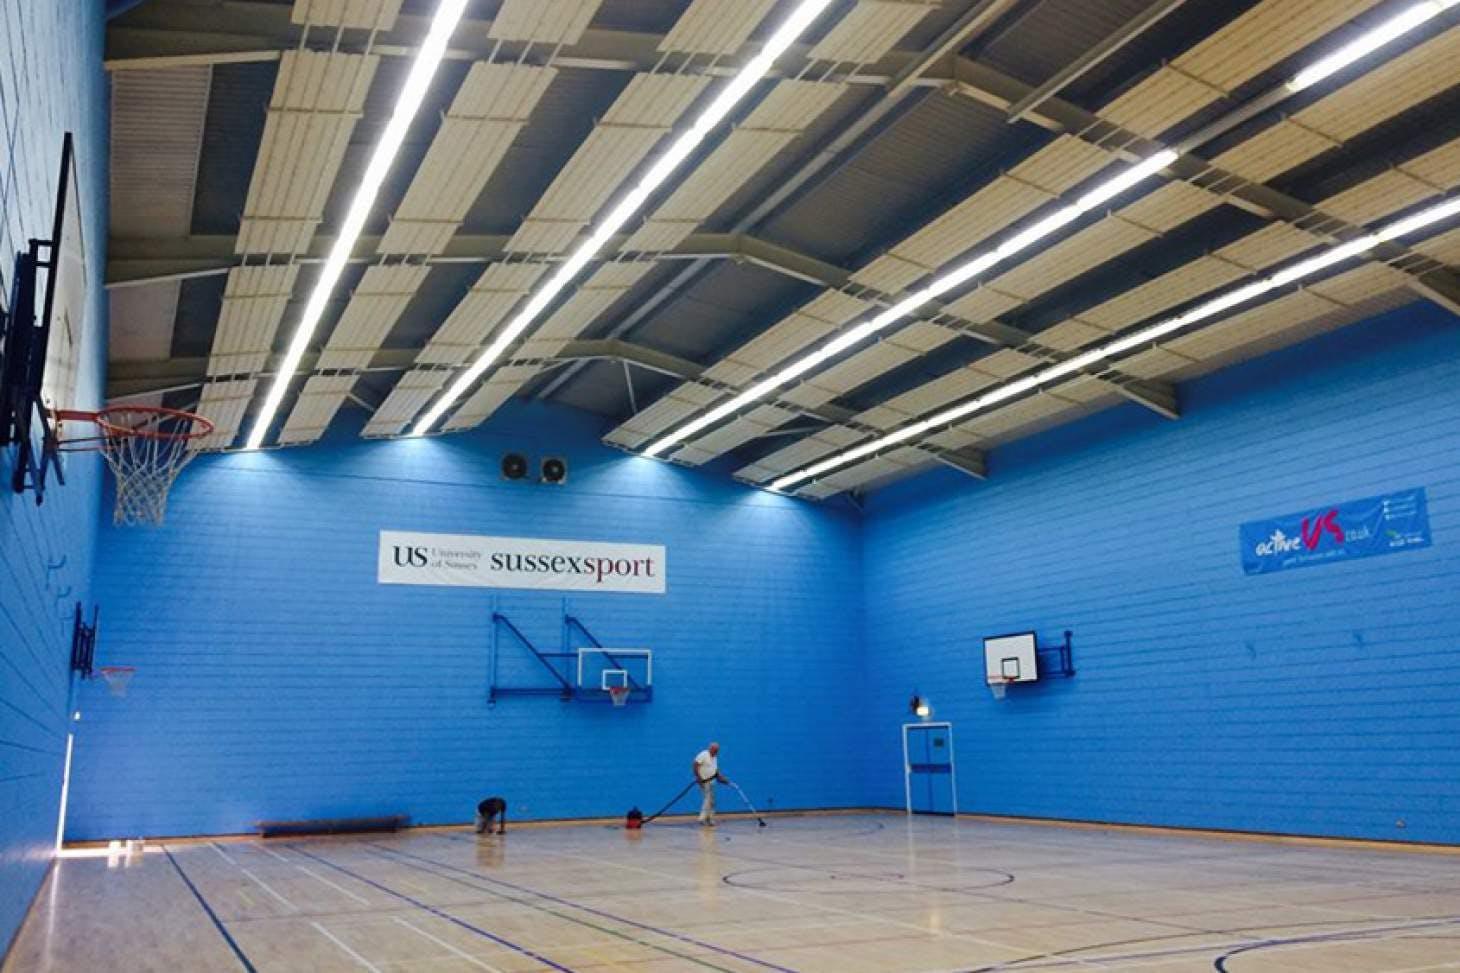 University Of Sussex Sport Centre Nets | Sports hall cricket facilities